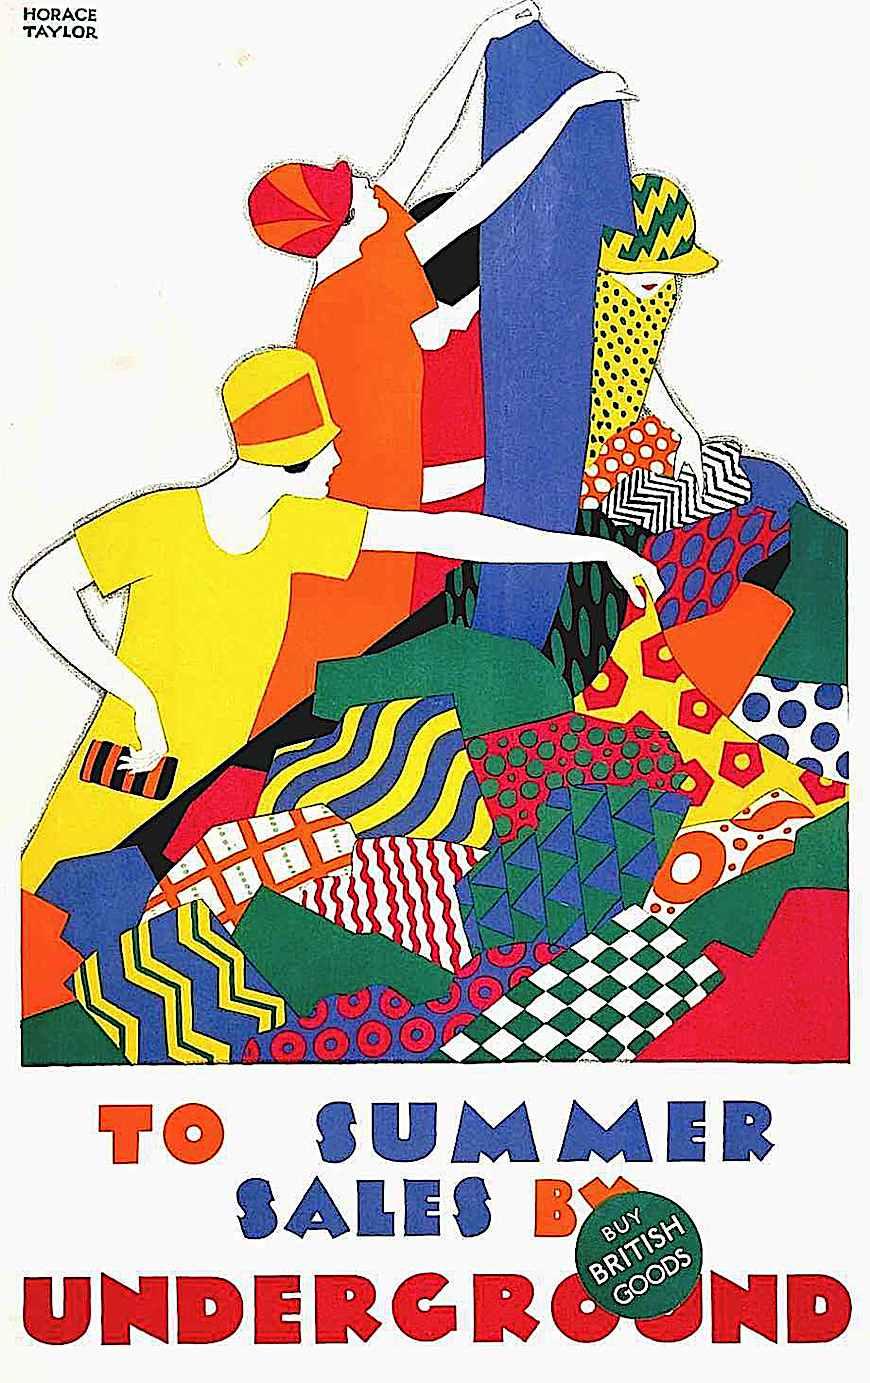 Horace Taylor poster art 1926